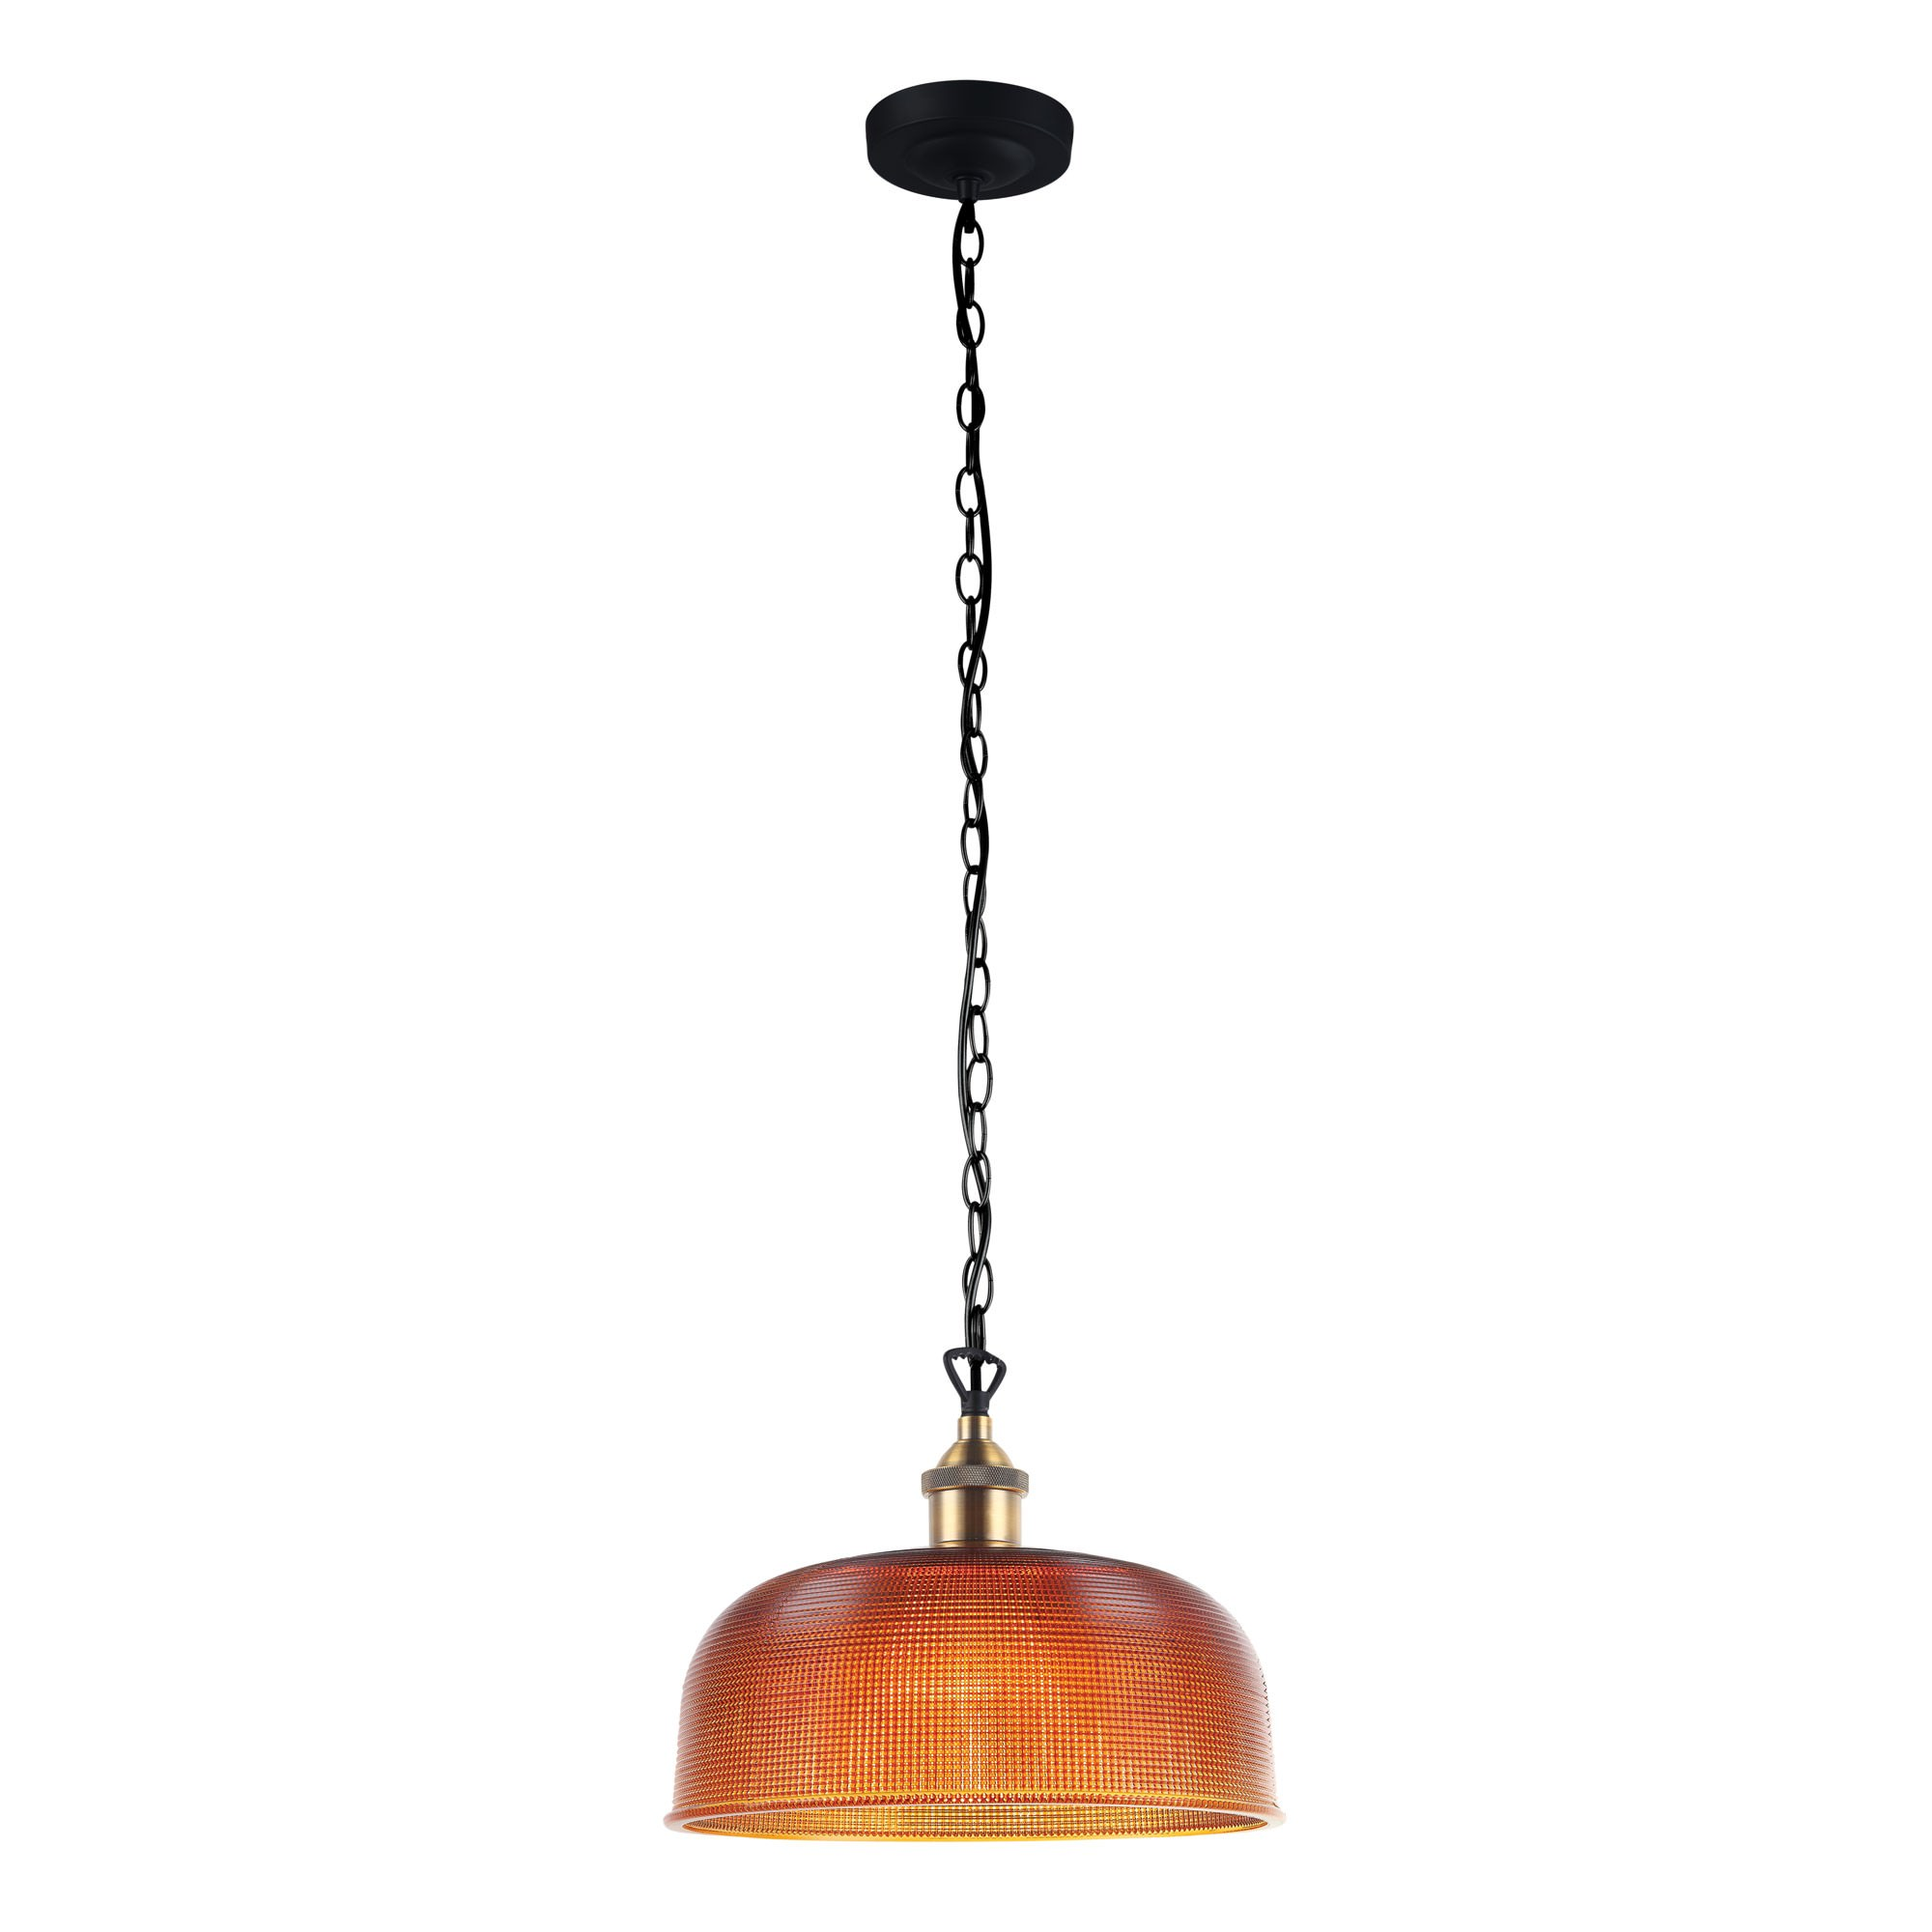 Maison Halophane Glass Pendant Light, 27cm, Amber